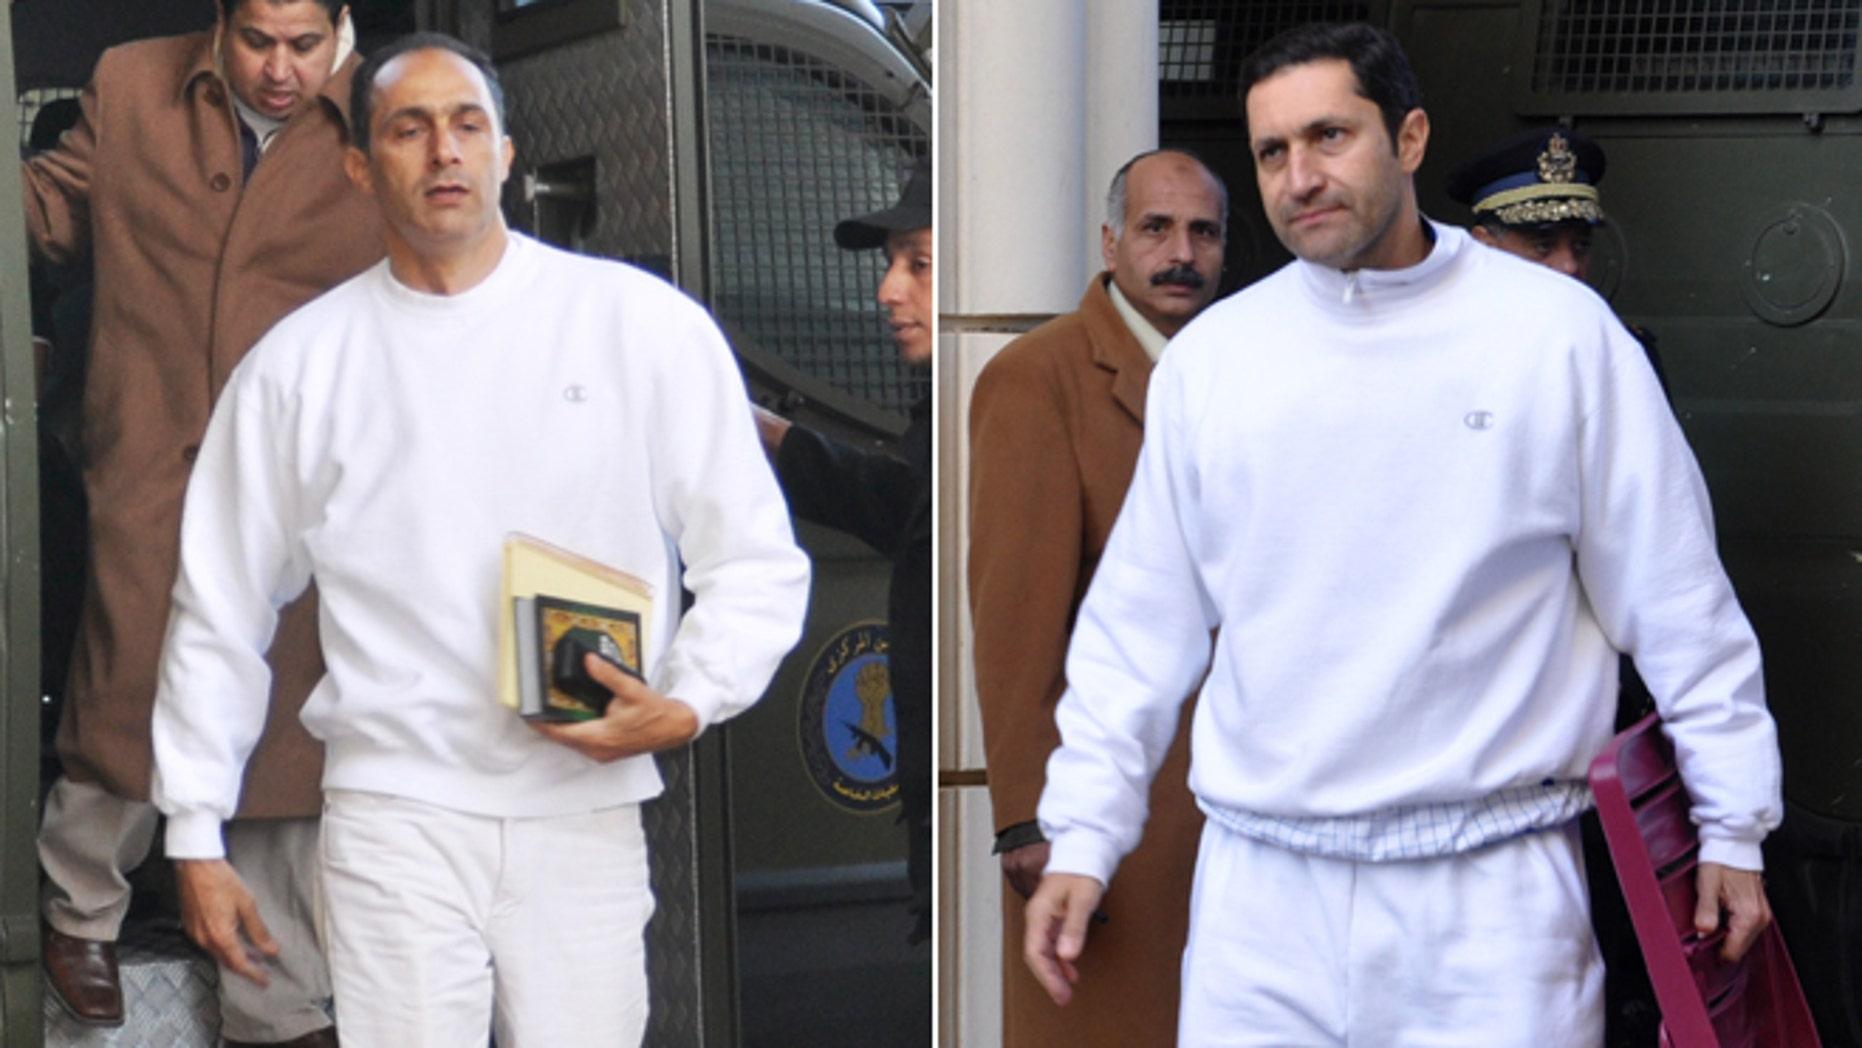 Jan. 24, 2012: FILE - Alaa Mubarak, right, and Gamal Mubarak, left, sons of former Egyptian president Hosni Mubarak, arrive at the court house in Cairo, Egypt.